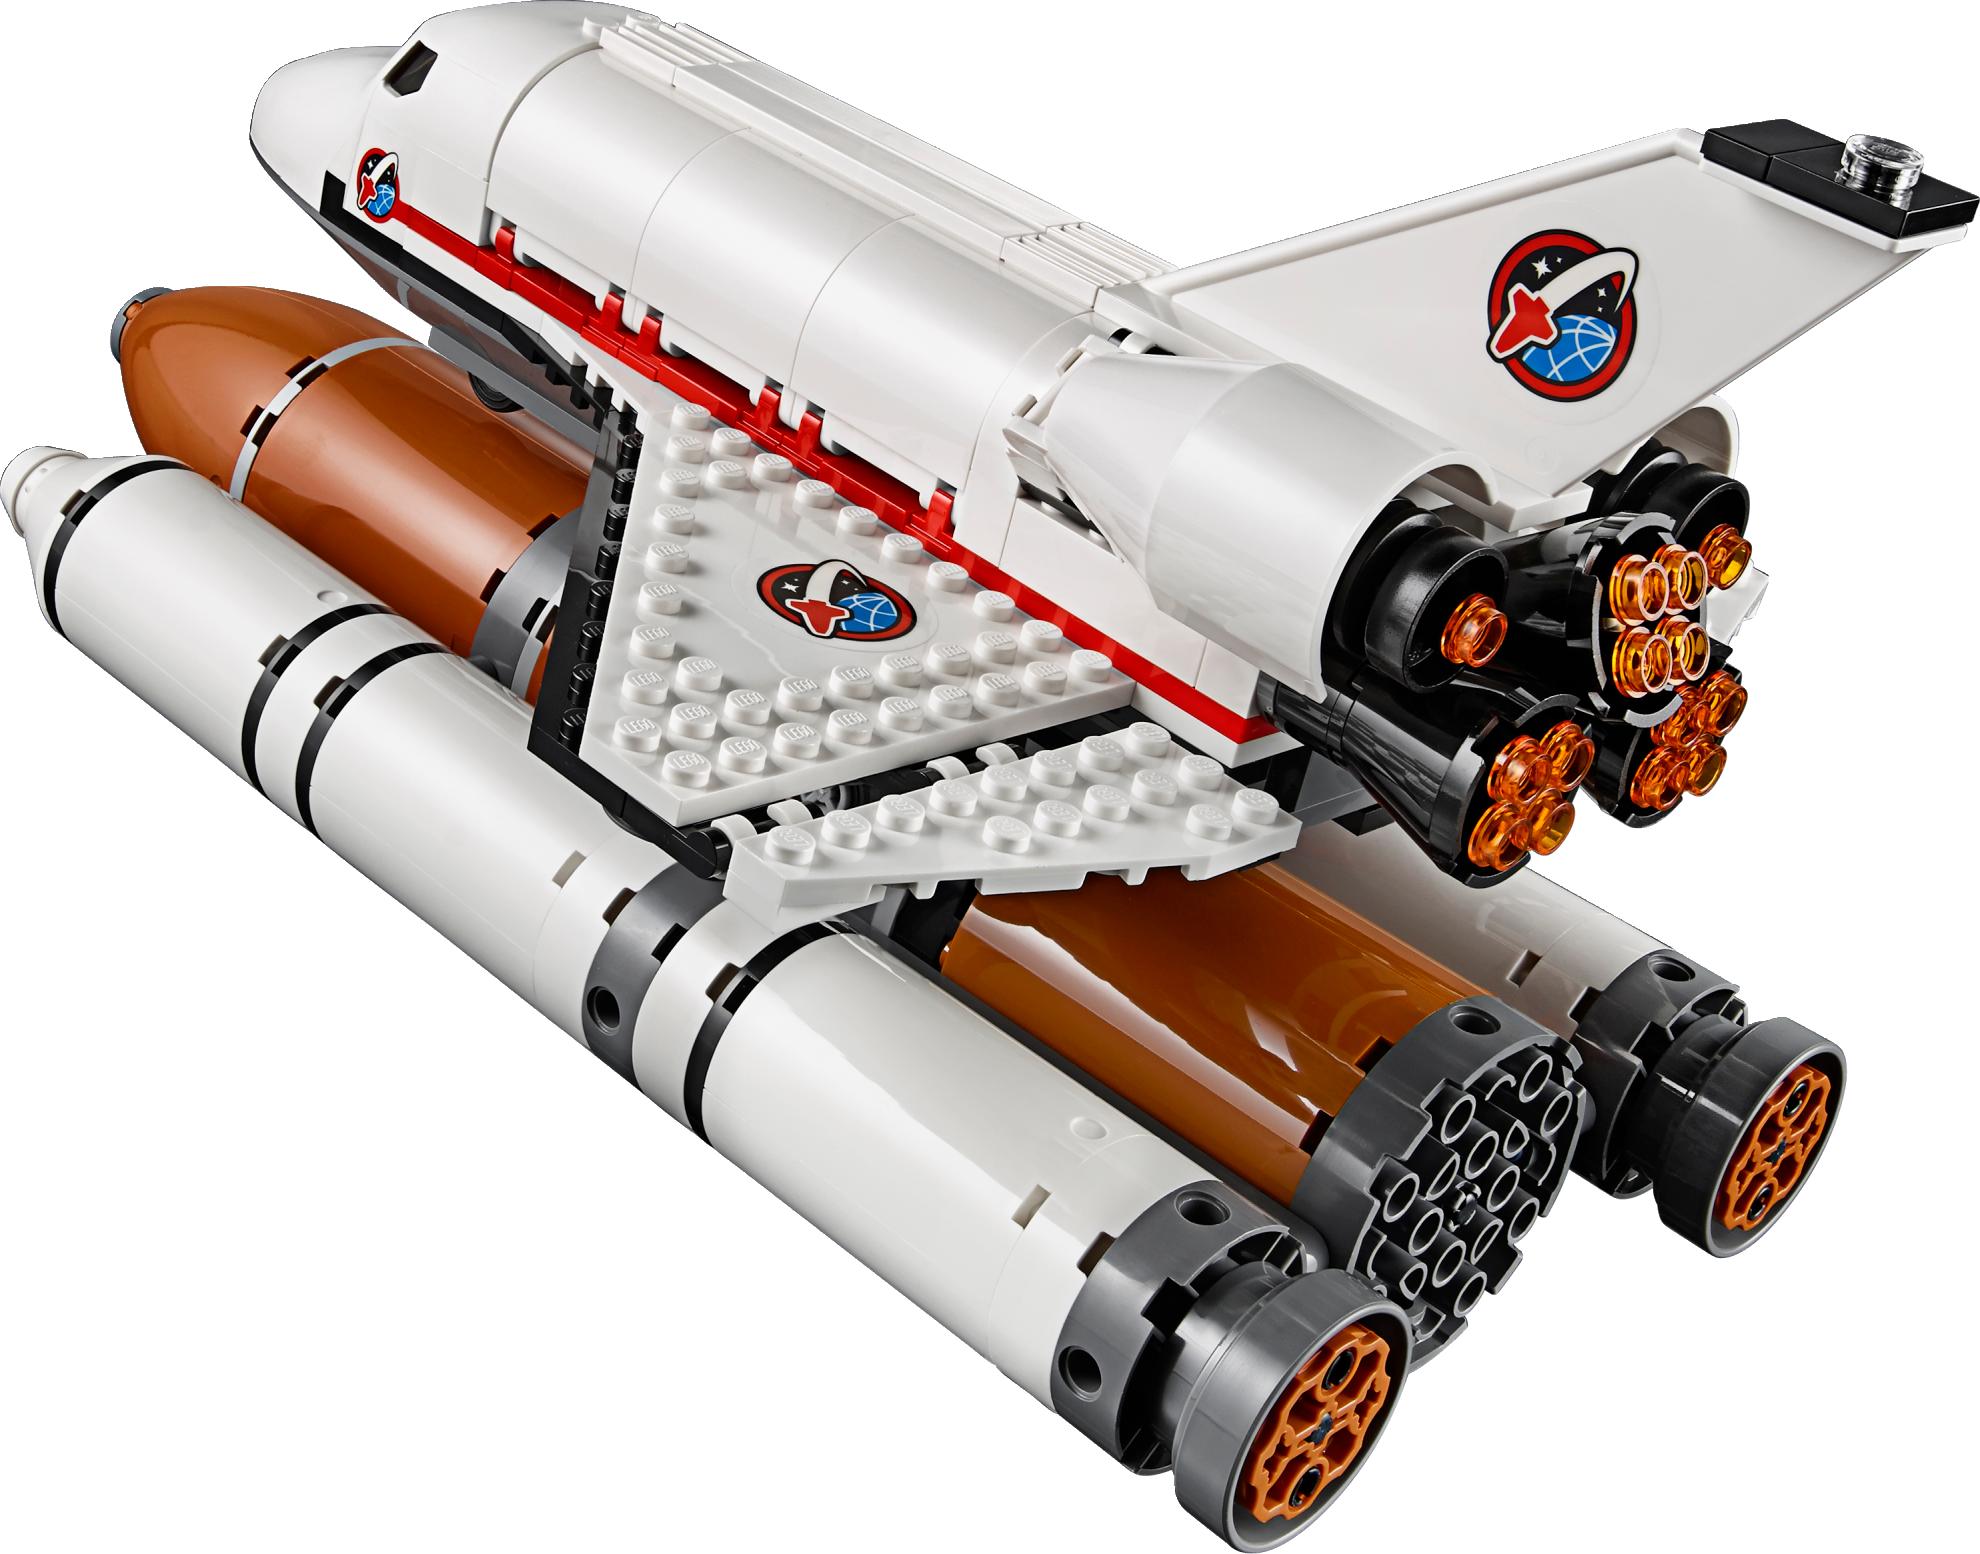 Spaceport